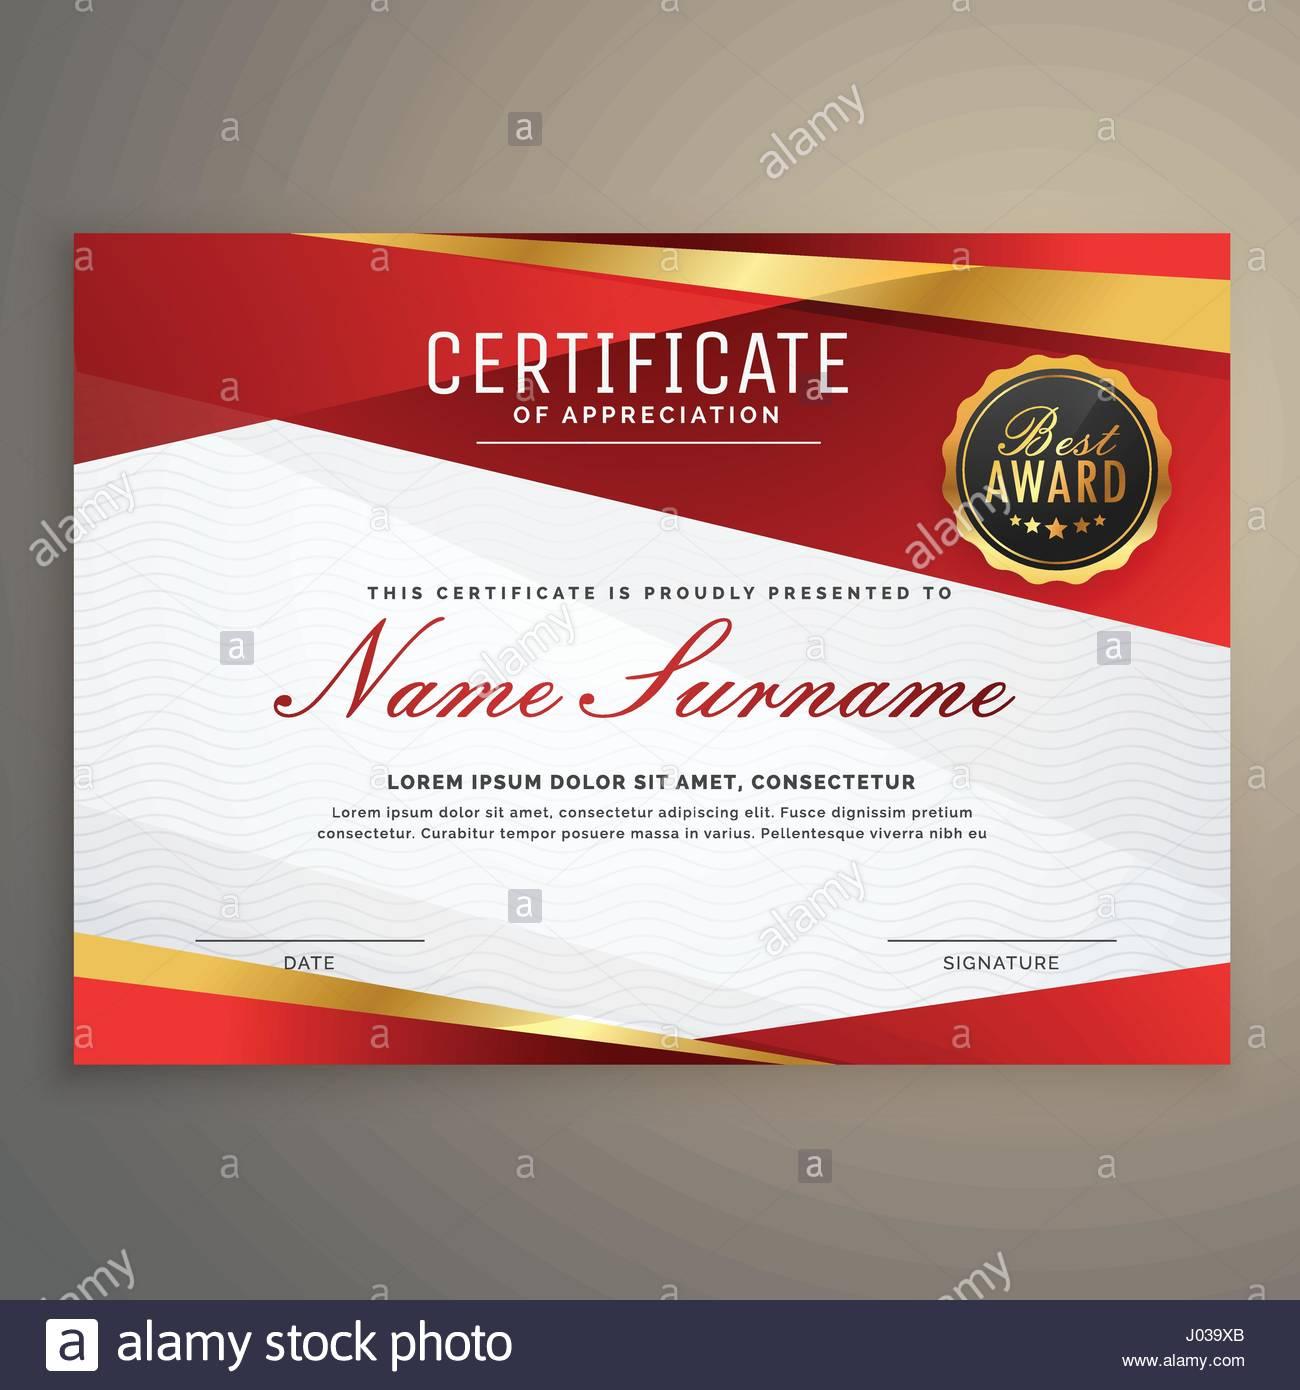 Erfreut Zertifikat Design Vorlage Galerie - Entry Level Resume ...